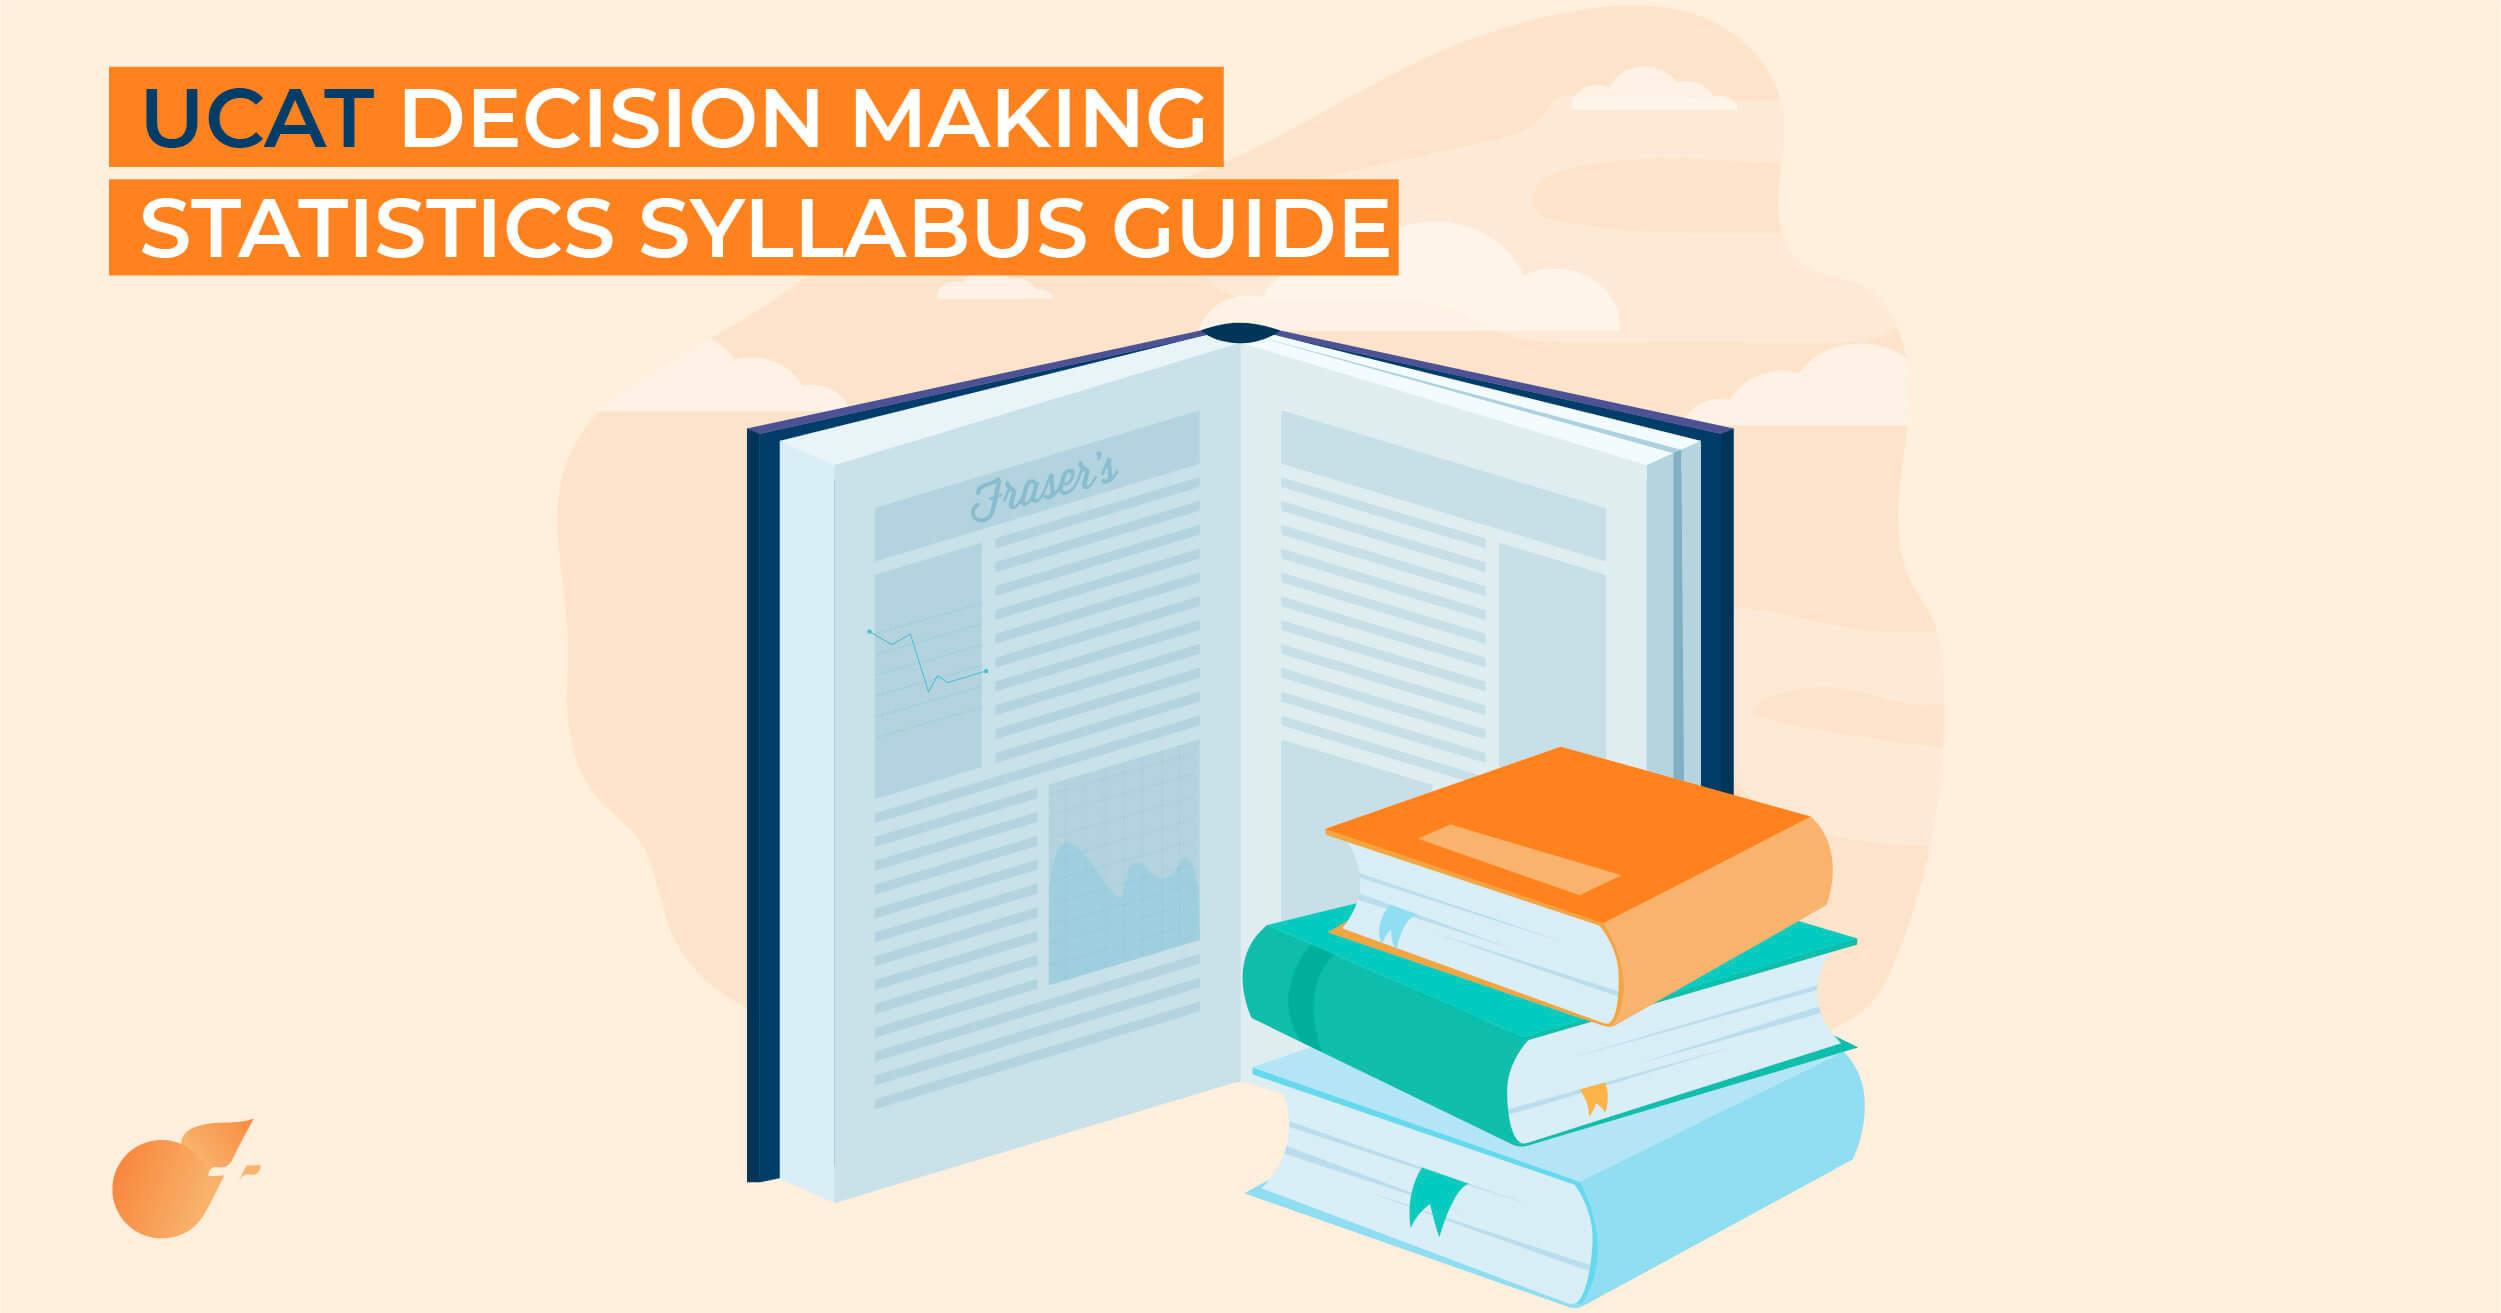 UCAT Decision Making Statistics Syllabus Guide